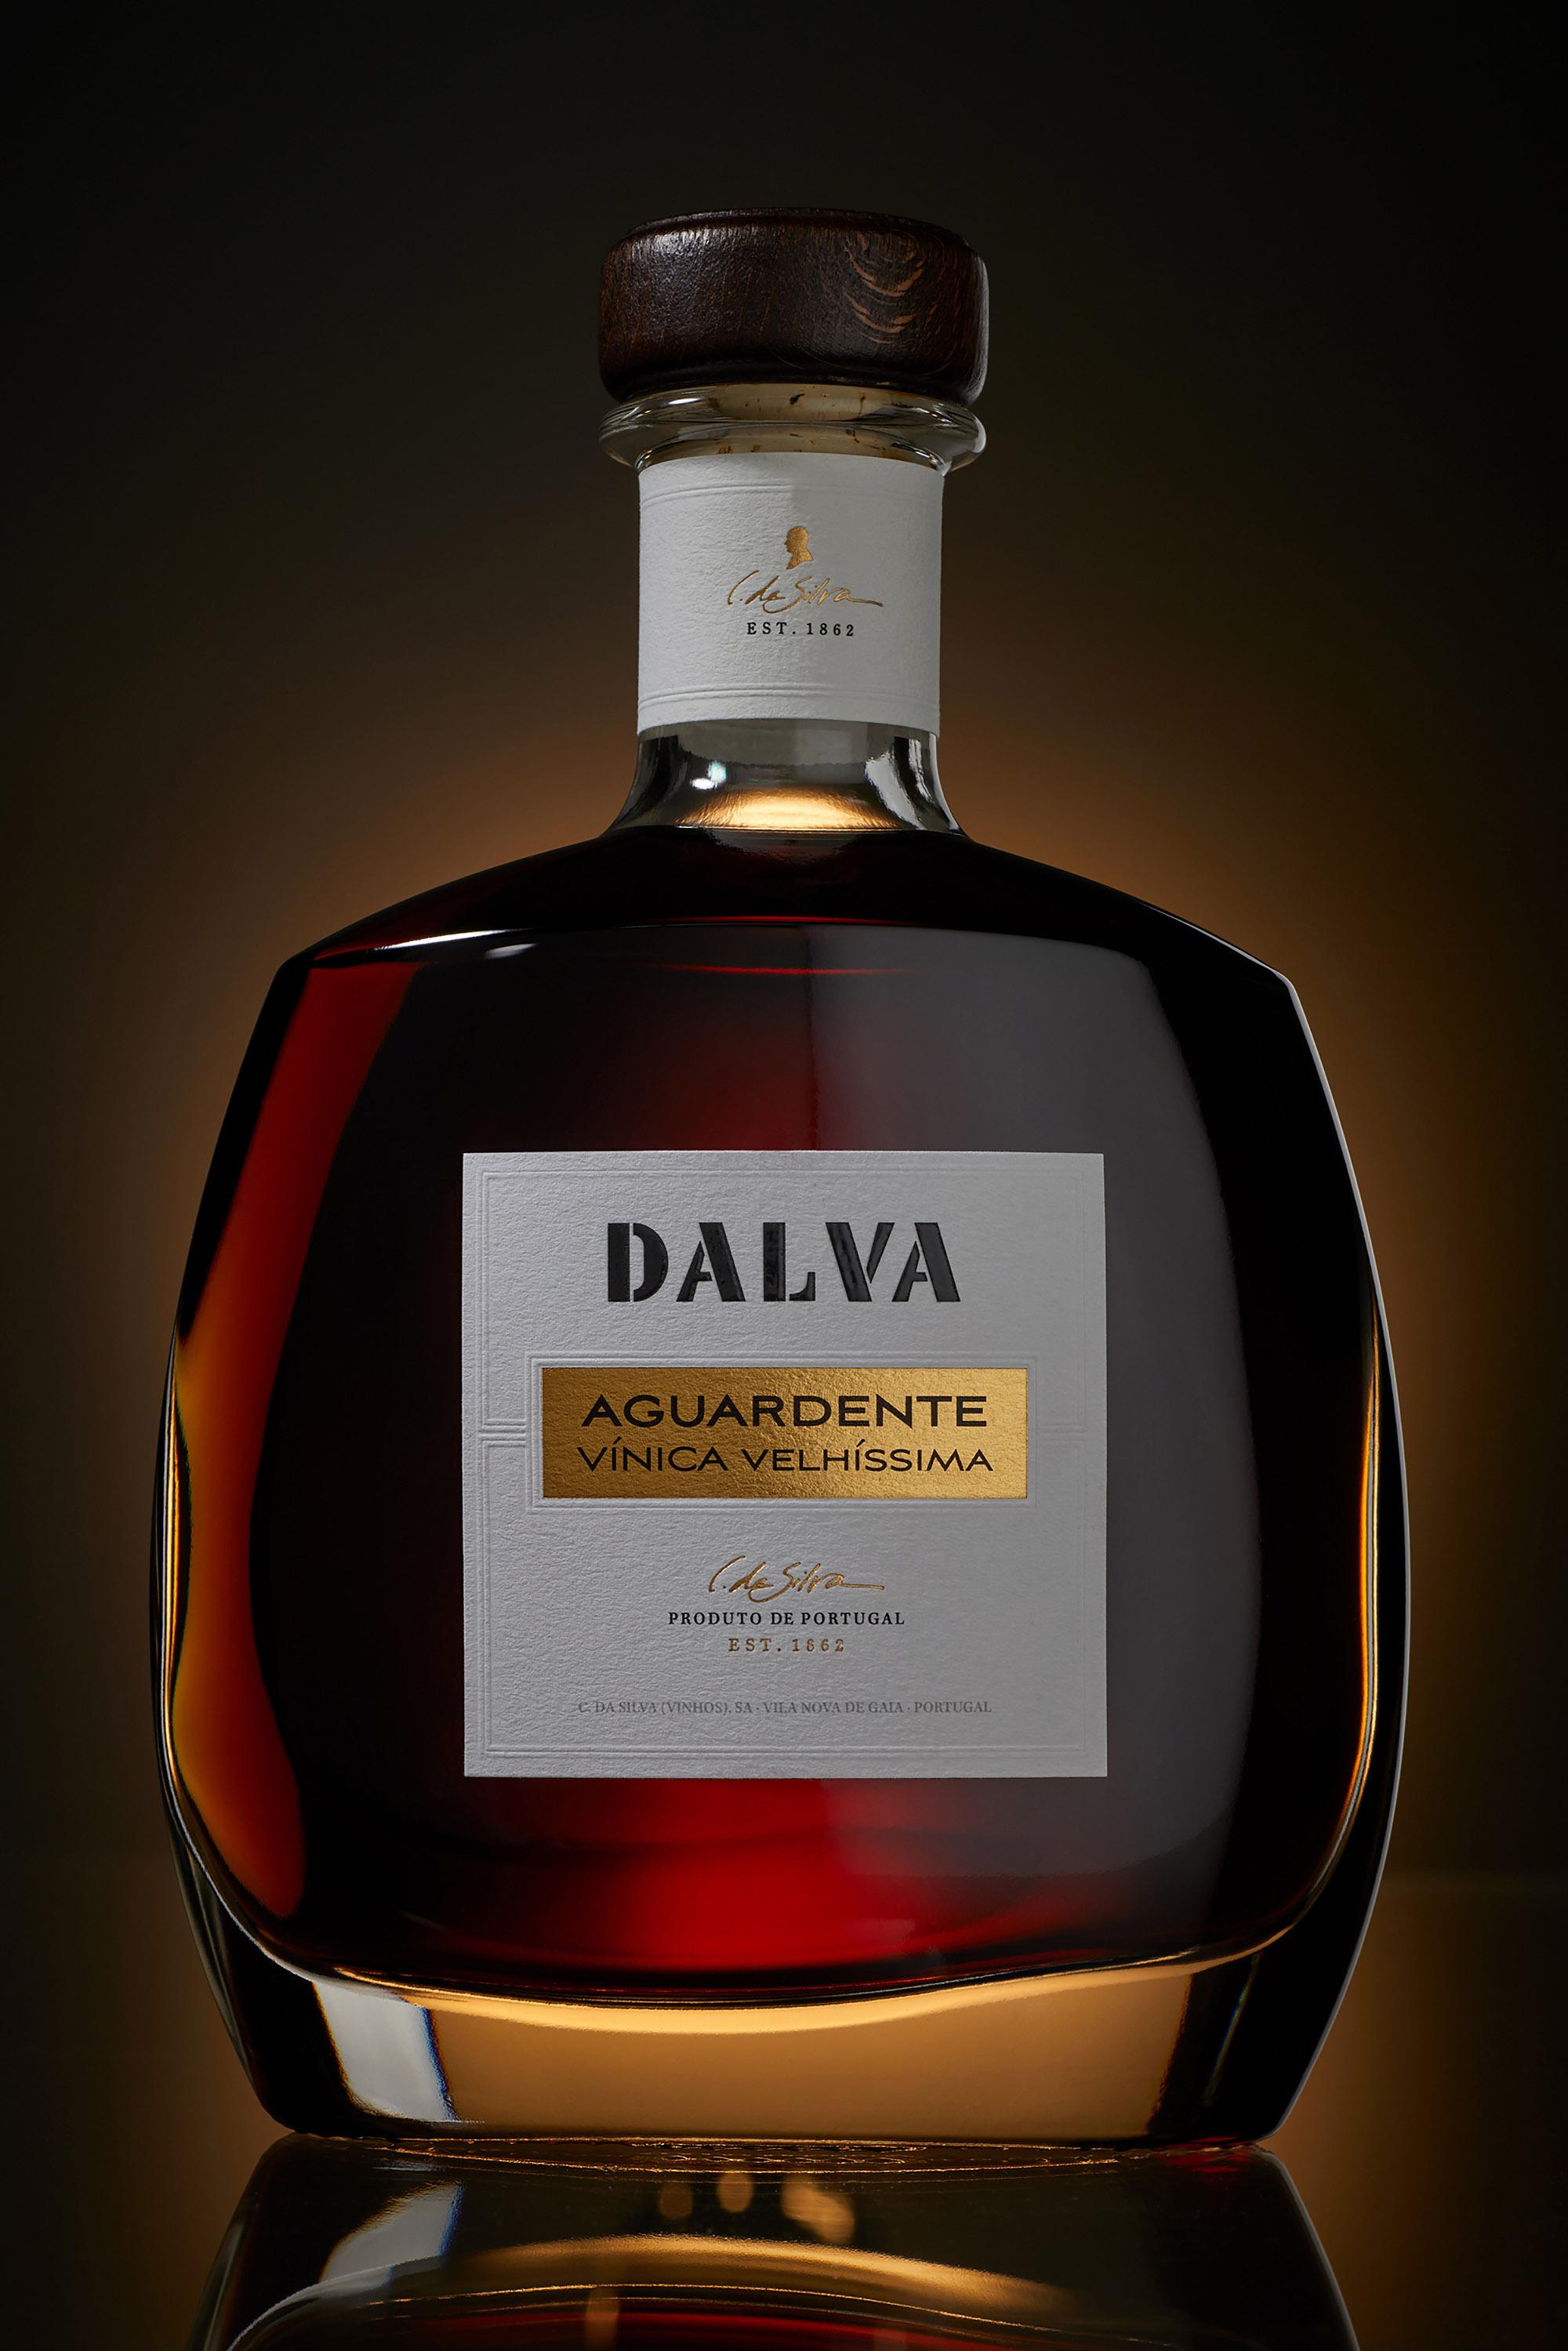 Dalva Aguardente Vínica Velhíssima by Omdesign